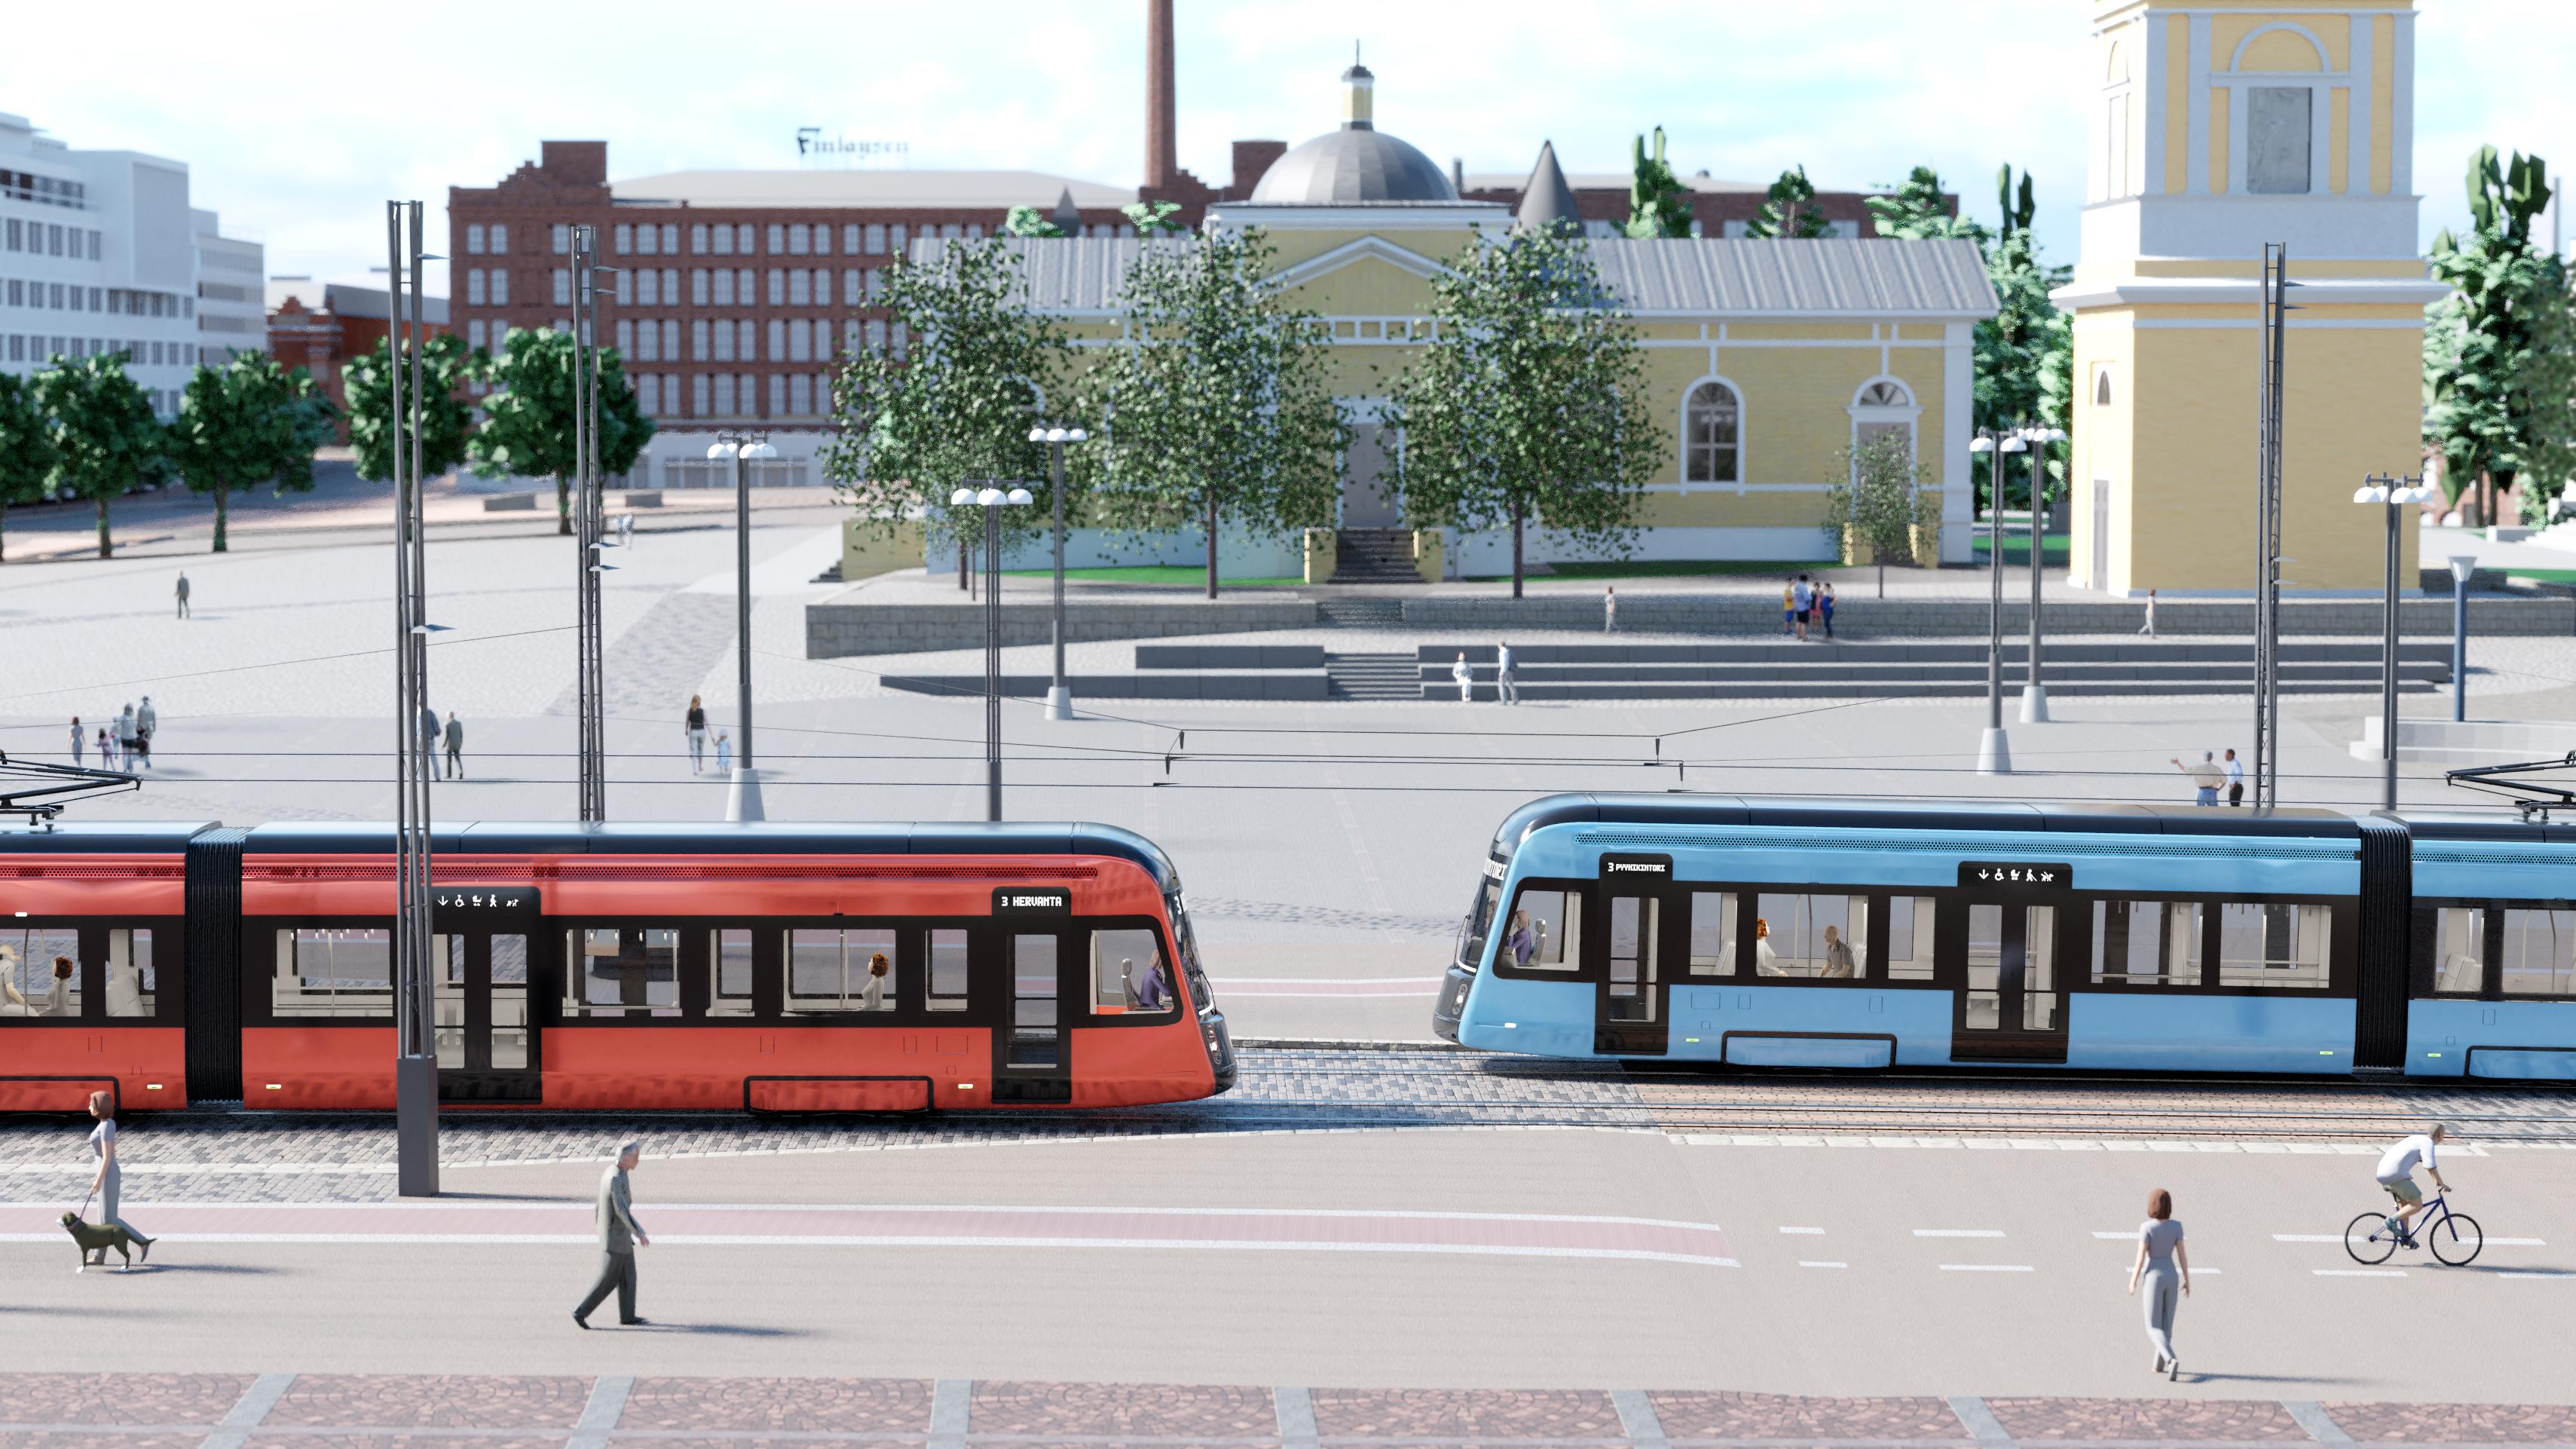 Tampere Esitteli Tulevan Raitiovaununsa Kuntalehti